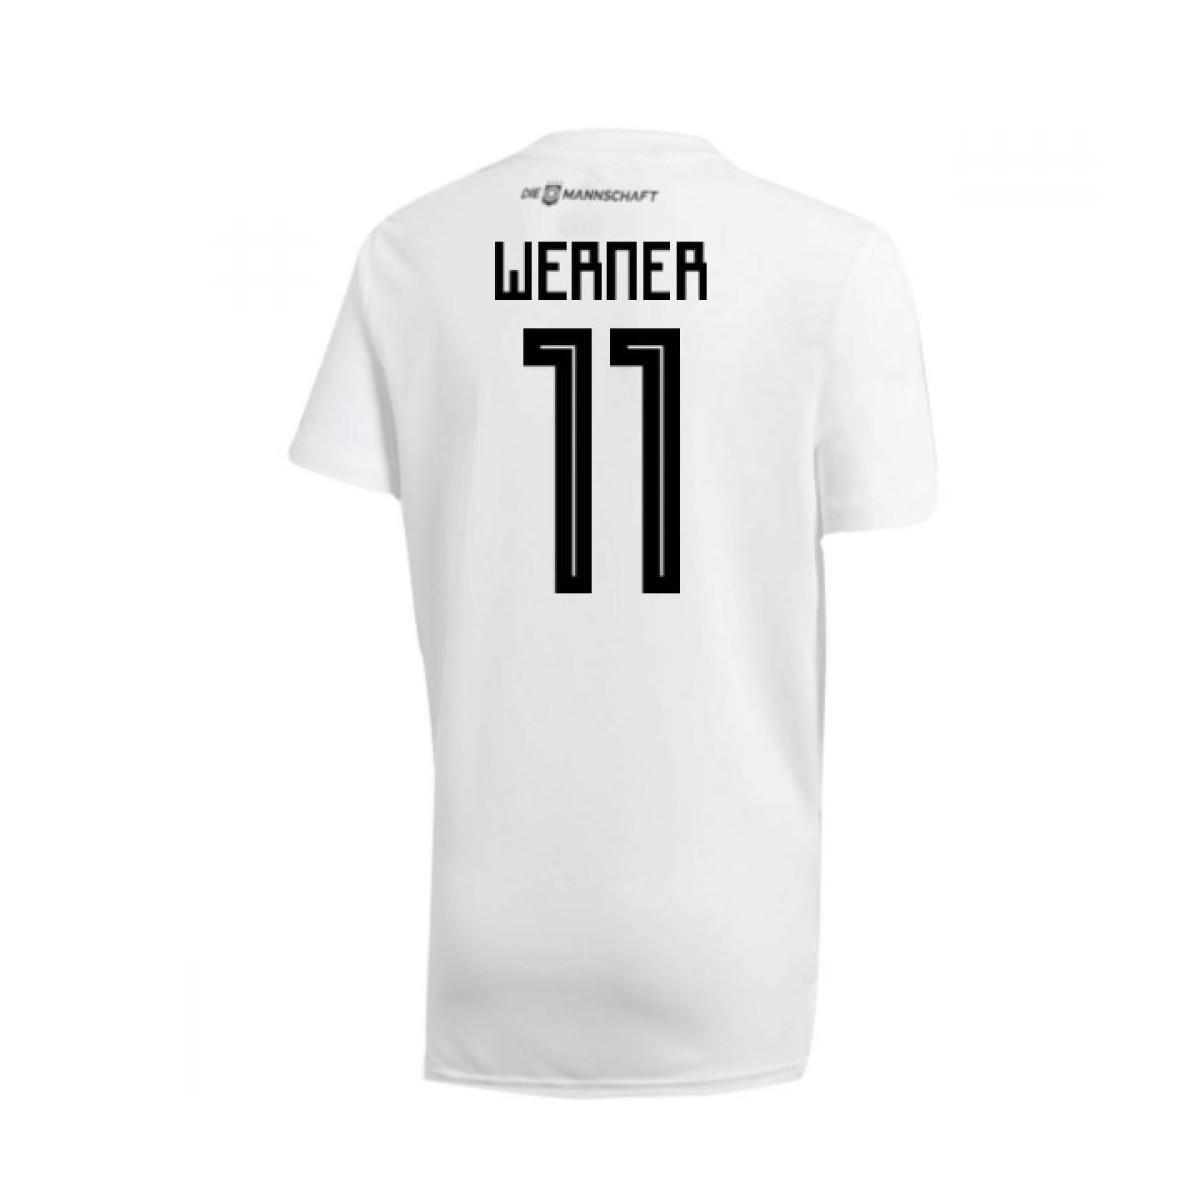 5d889ff1d adidas 2018-19 Germany Home Training Shirt (werner 11) Men s T Shirt ...